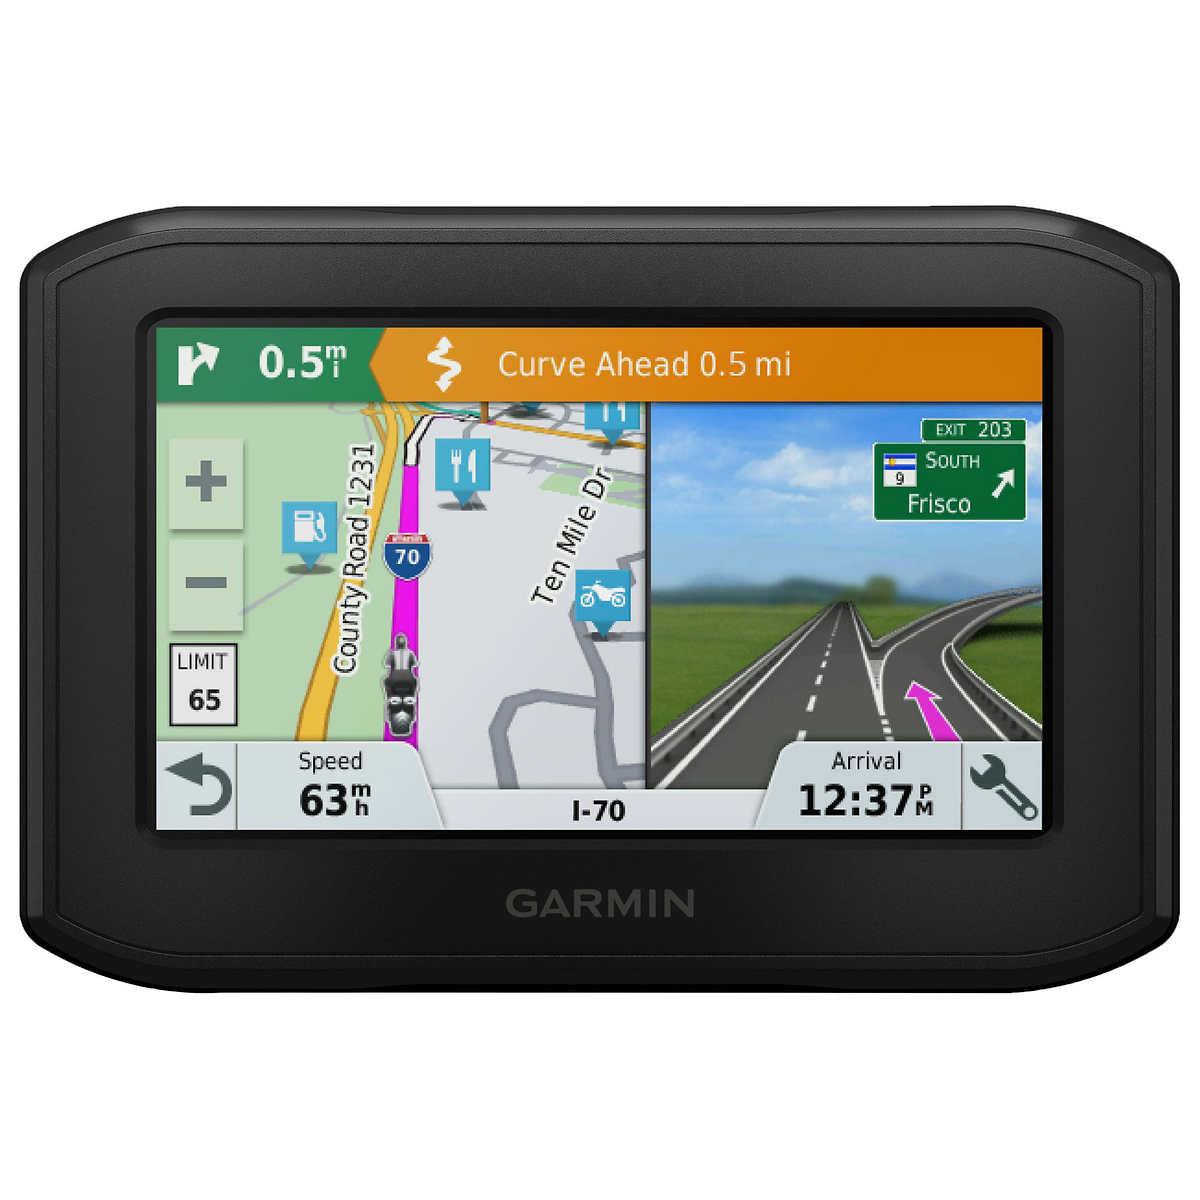 273e64b7213 ... Garmin Zumo 396 LMT-S Motorcycle GPS. 1 1